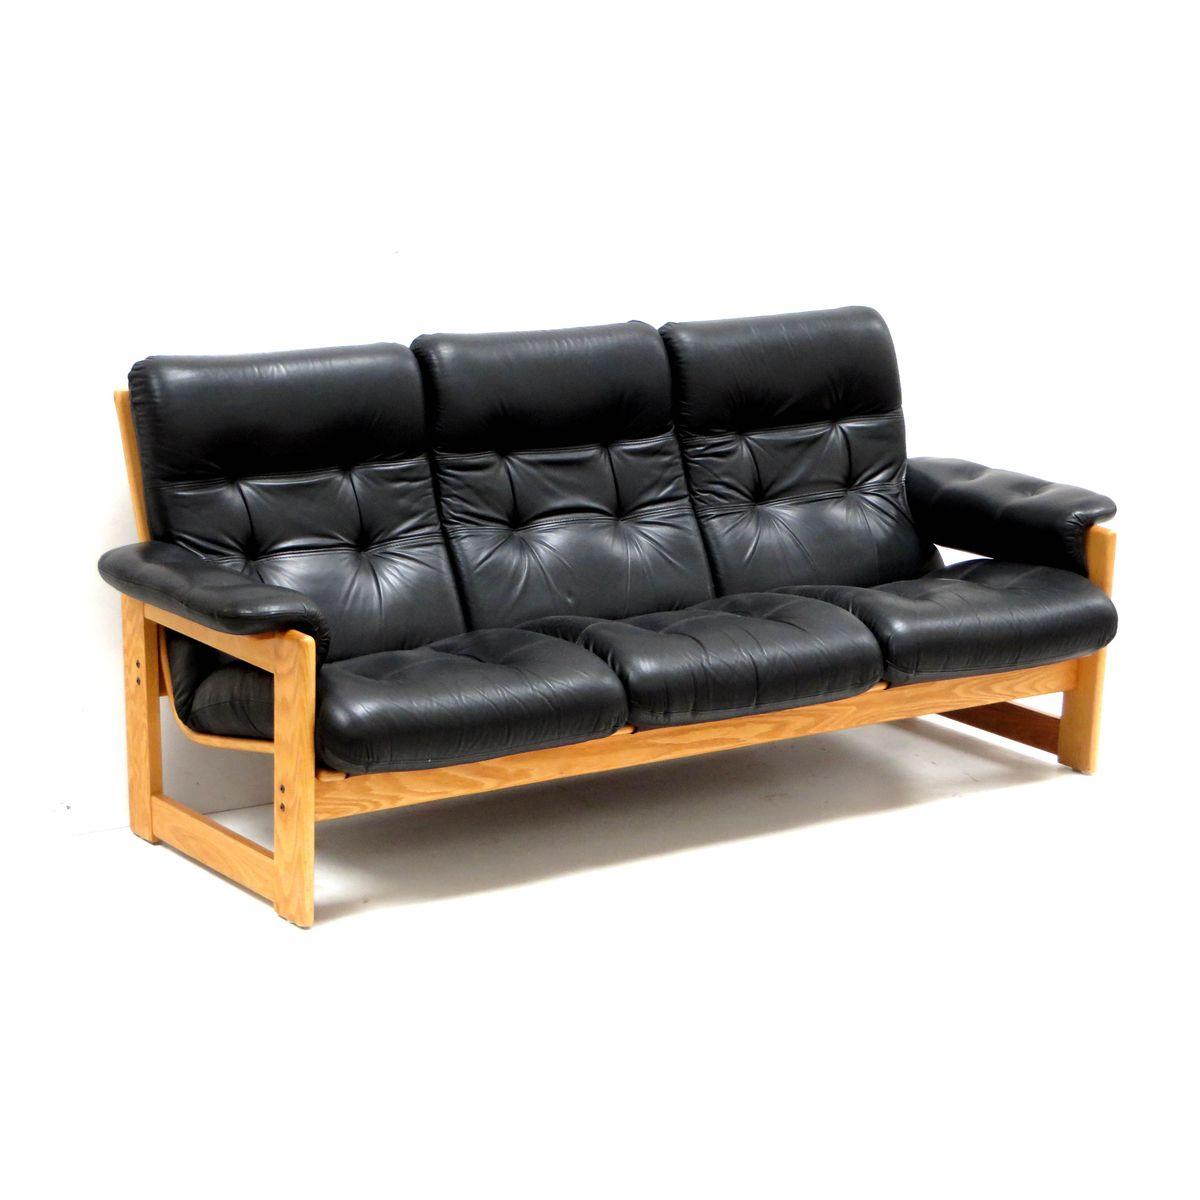 schwarzes vintage ledersofa bei pamono kaufen. Black Bedroom Furniture Sets. Home Design Ideas